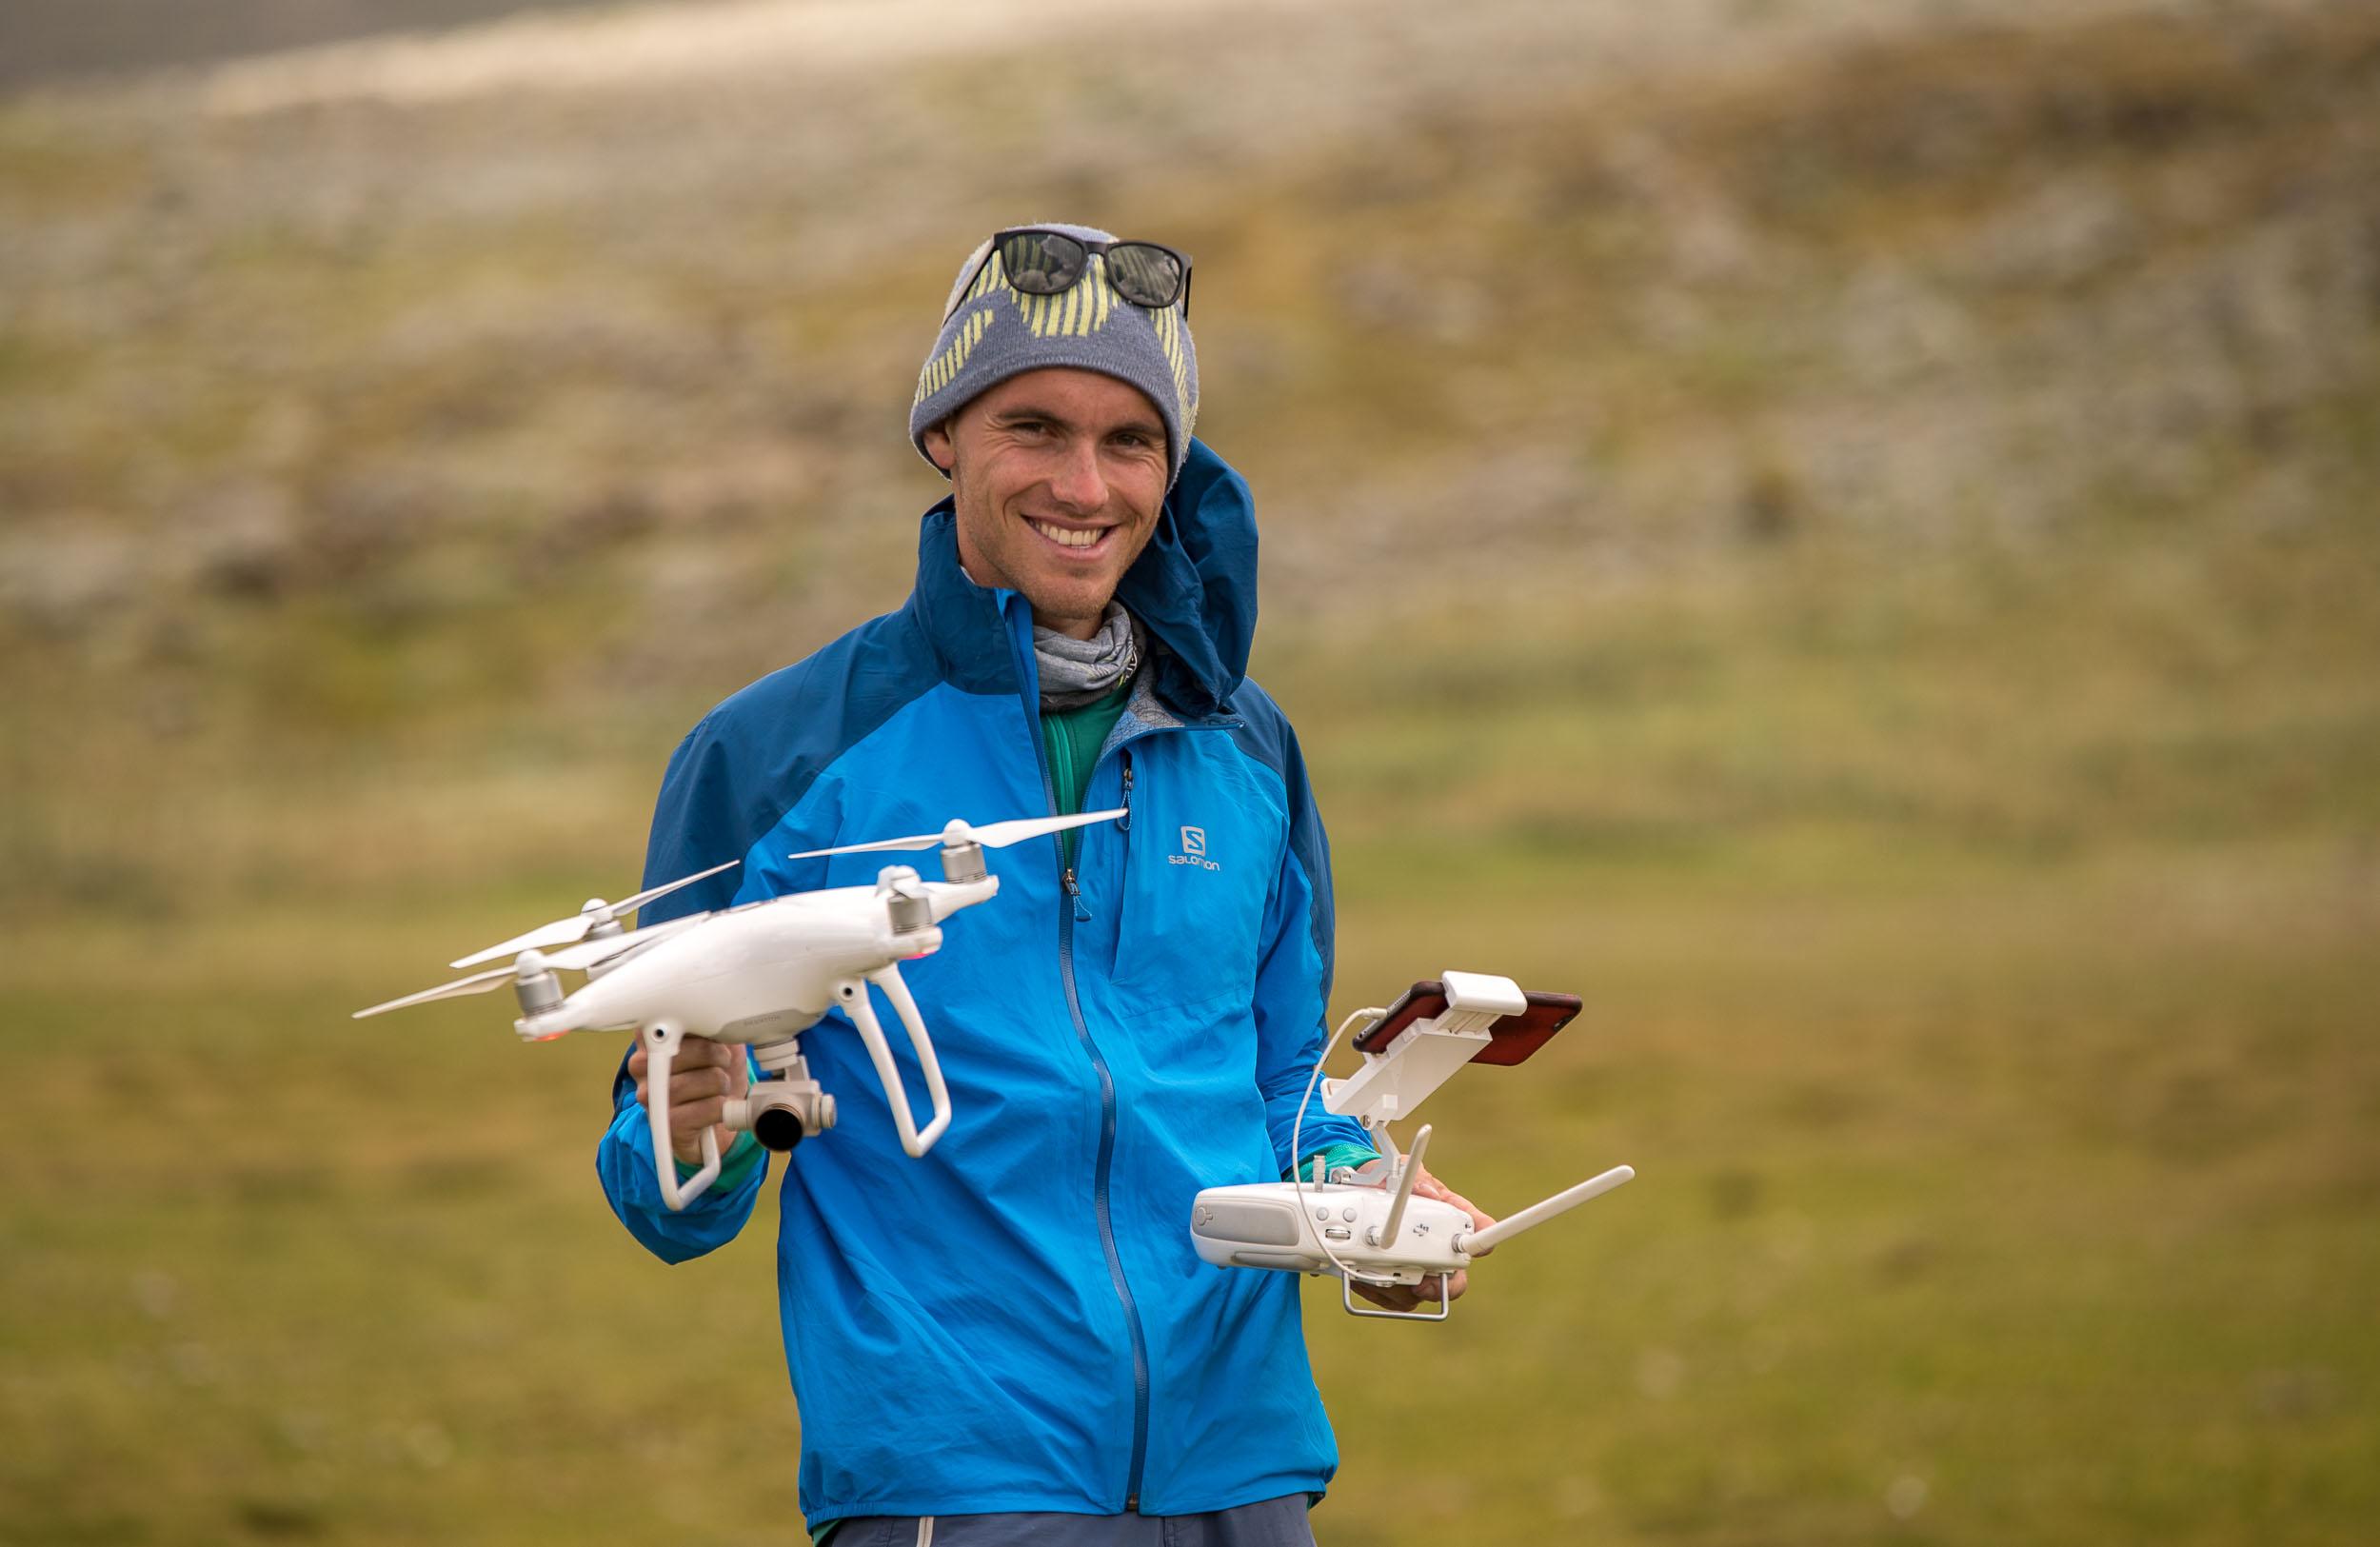 Drohnenaufnahmen in den Bale Bergen in Äthopien   Foto: Janis Klinkenberg |  Download